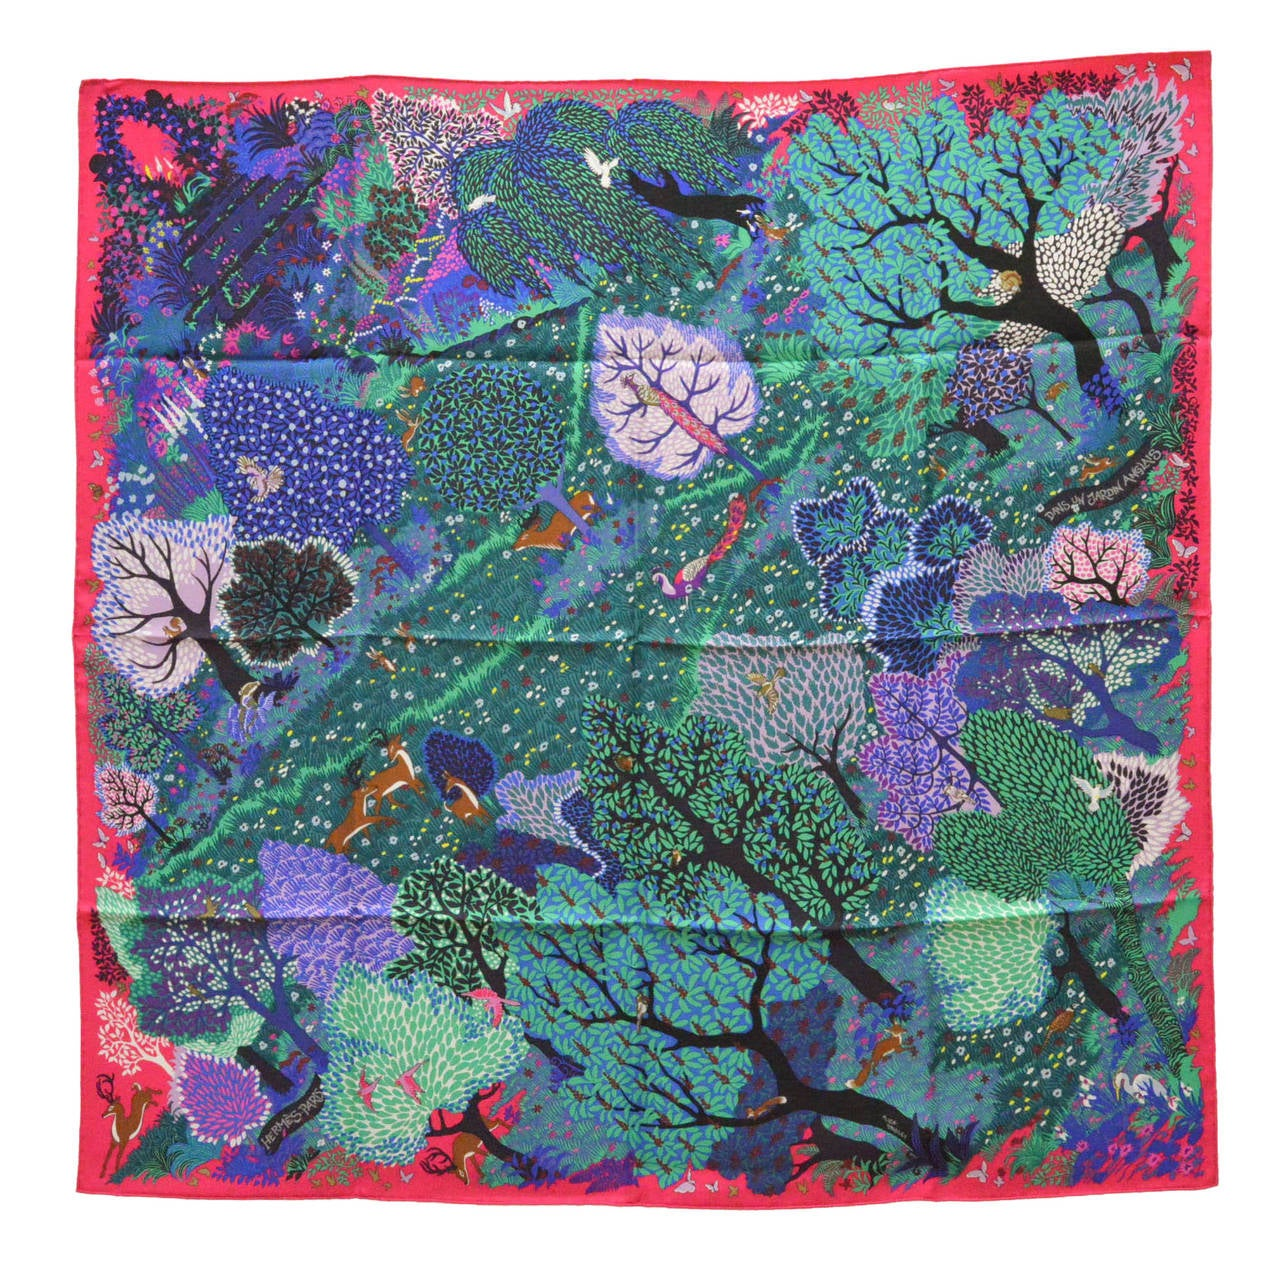 Hermes carre twill dans un jardin anglais silk bright pink Dans un jardin anglais hermes